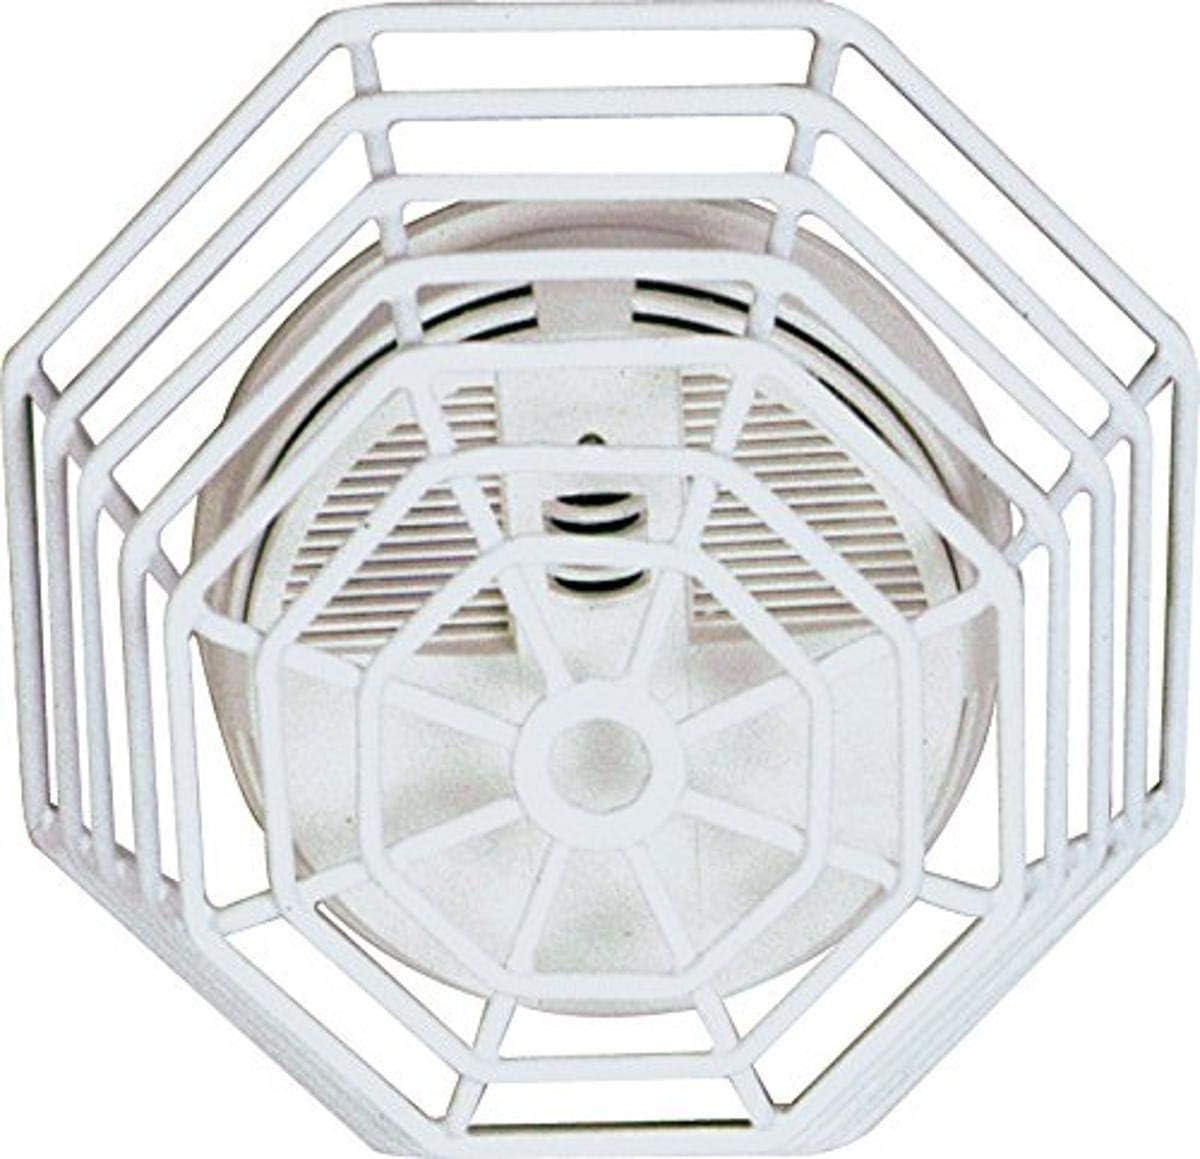 "Safety Technology International, Inc. STI-9601 Steel Web Stopper, 9 Gauge Corrosion Resistant Polyester Coated Cage, Flush Mount, 2.75"" Depth"